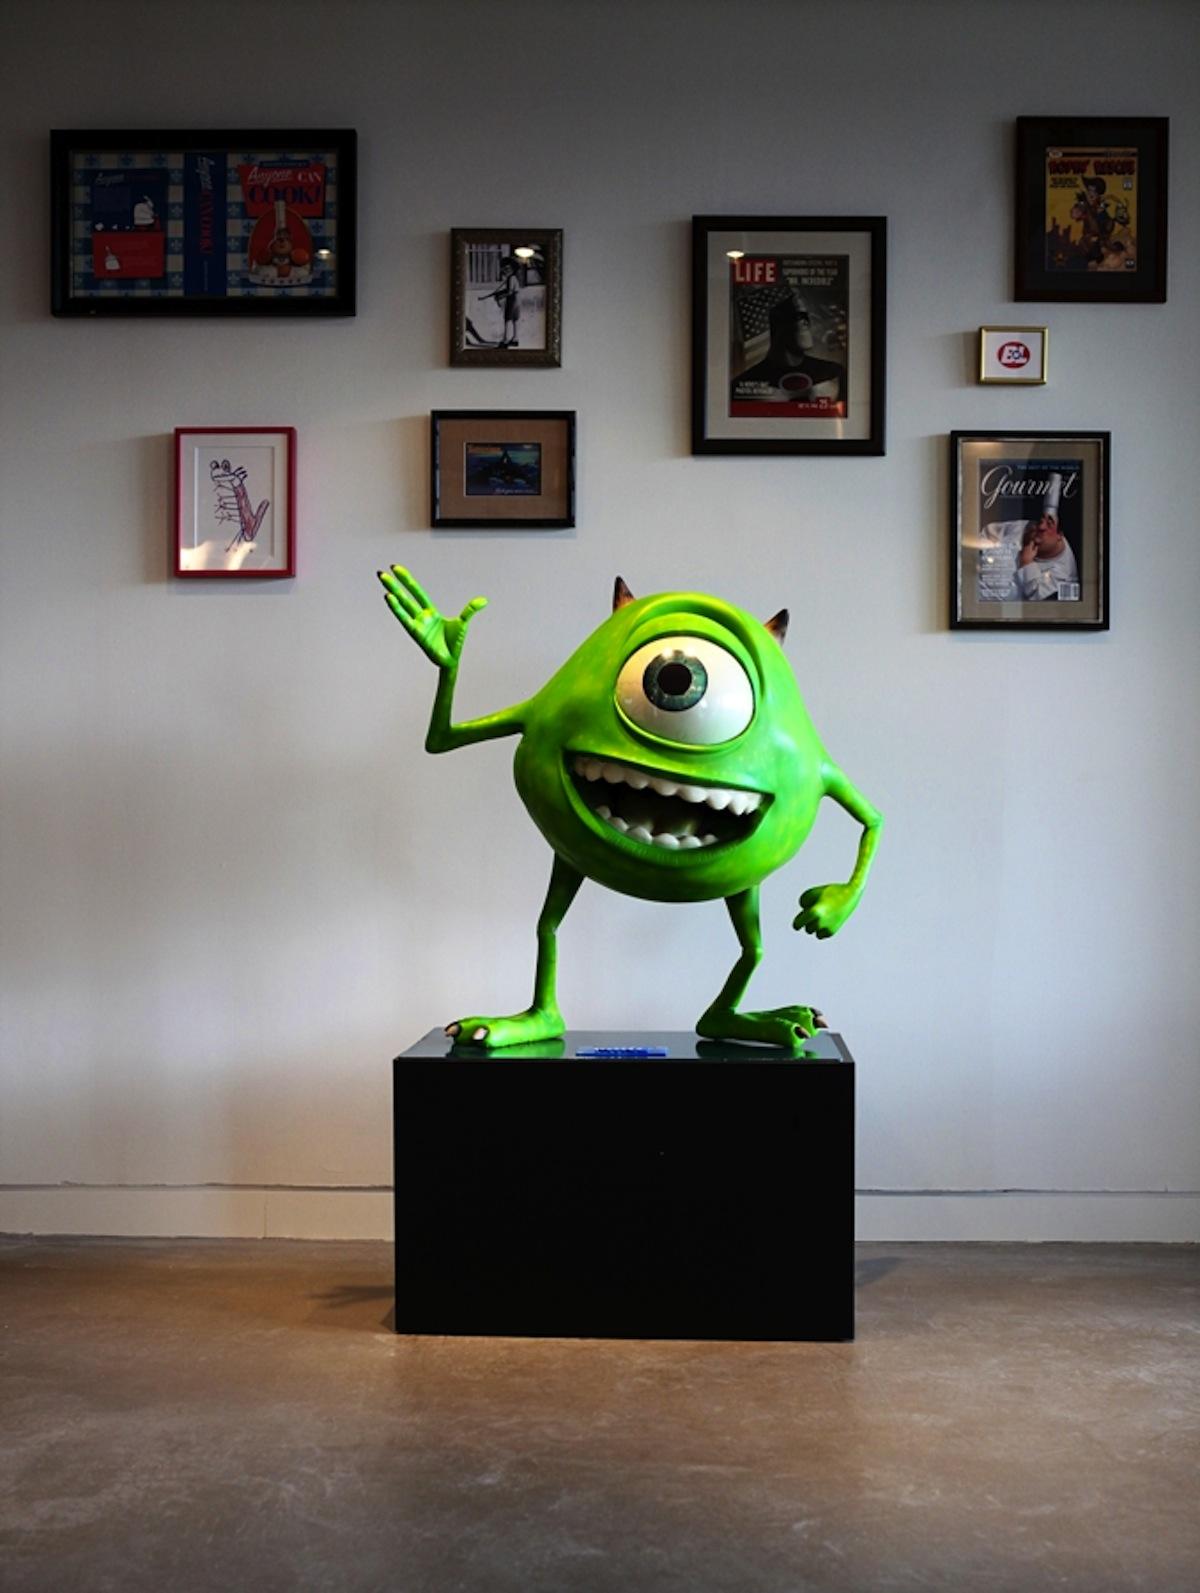 http://4.bp.blogspot.com/-eZOK2QJr9F4/TrtxbgGZ5YI/AAAAAAAABJU/g_nYQ2a2POs/s1600/Pixar_Canada2.jpg